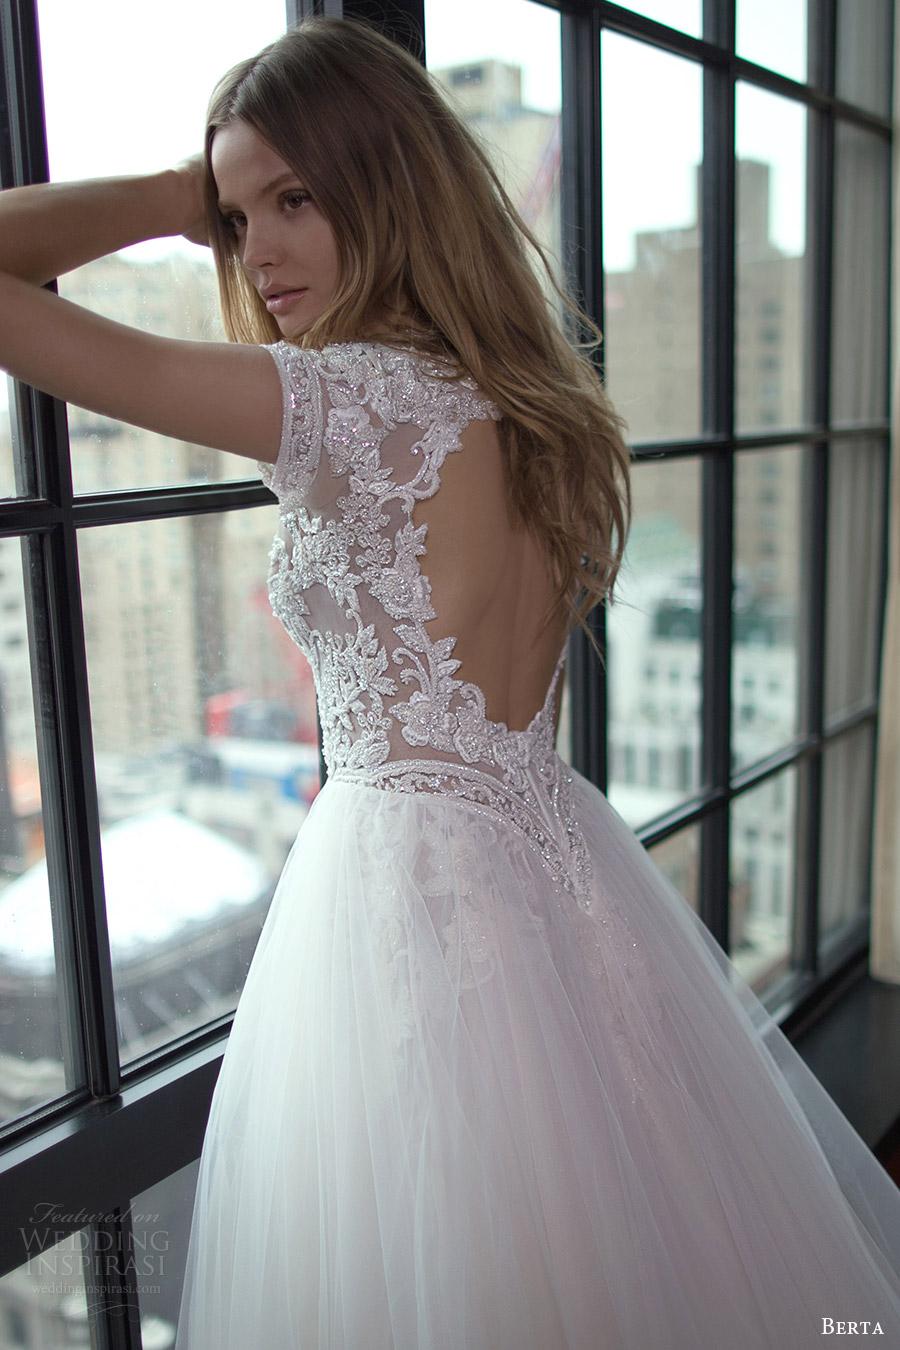 berta bridal fall 2016 cap sleeves deep sweetheart aline wedding dress (16 112) bv keyhole